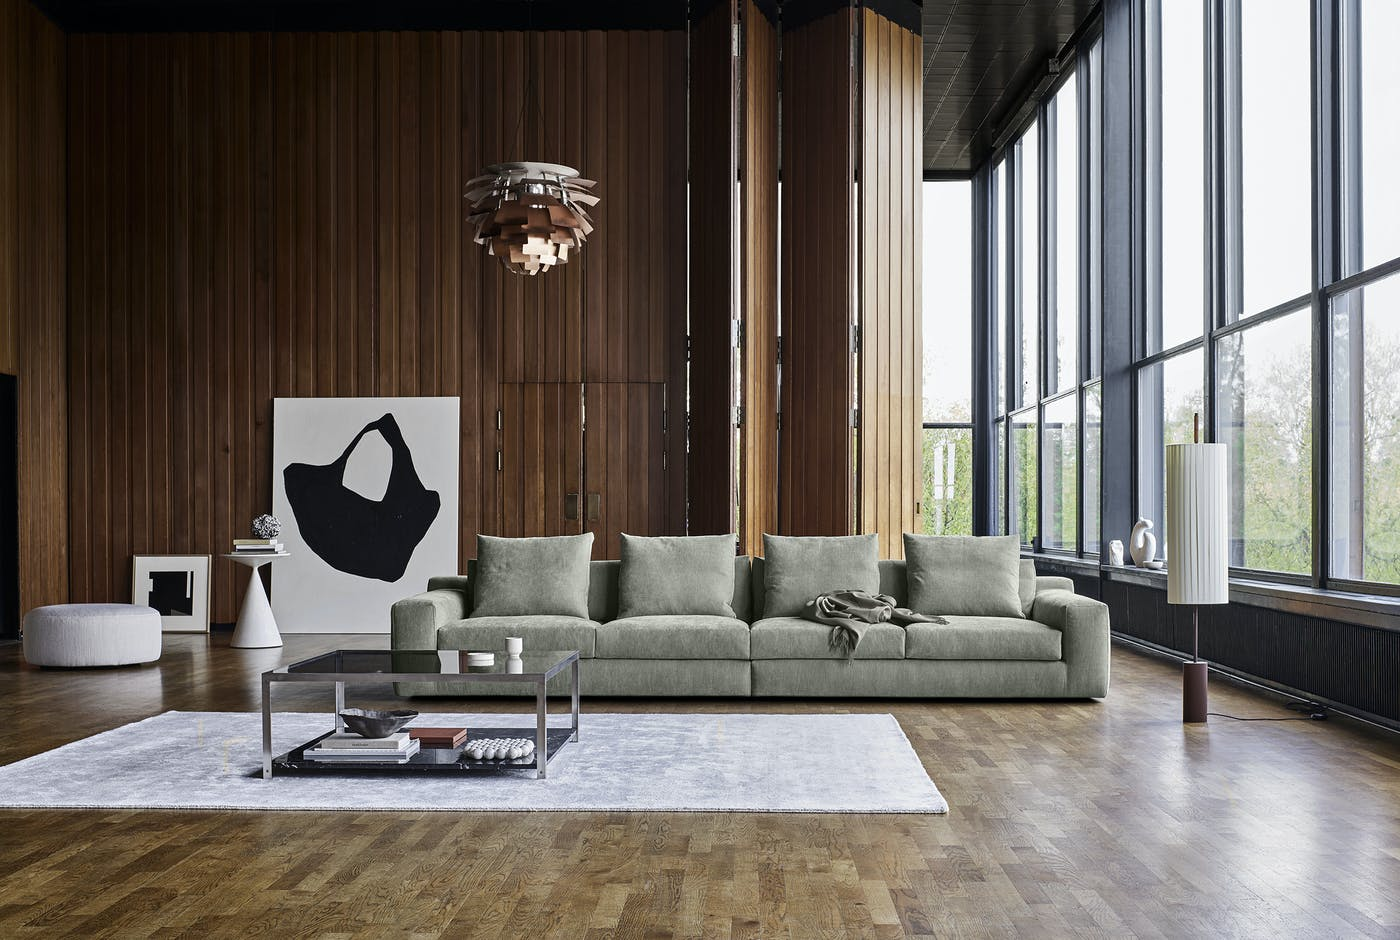 Aton sofa 366x109 cm Level 24 with Wheel footstool Stick carpet Frame table Envir 87871